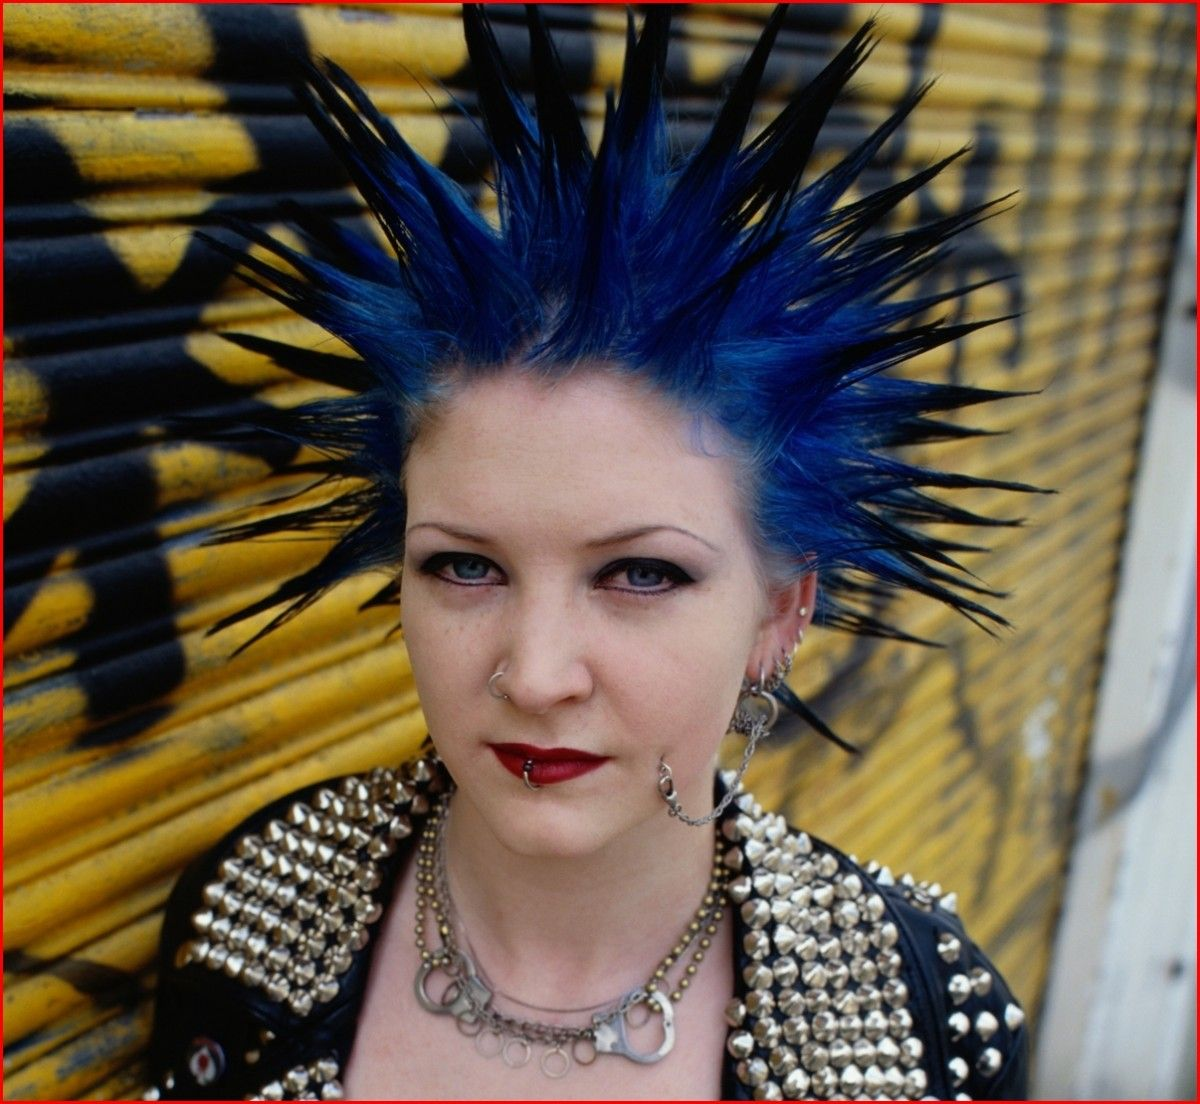 mohawk punk hairstyles | weird hairstyles | hair styles